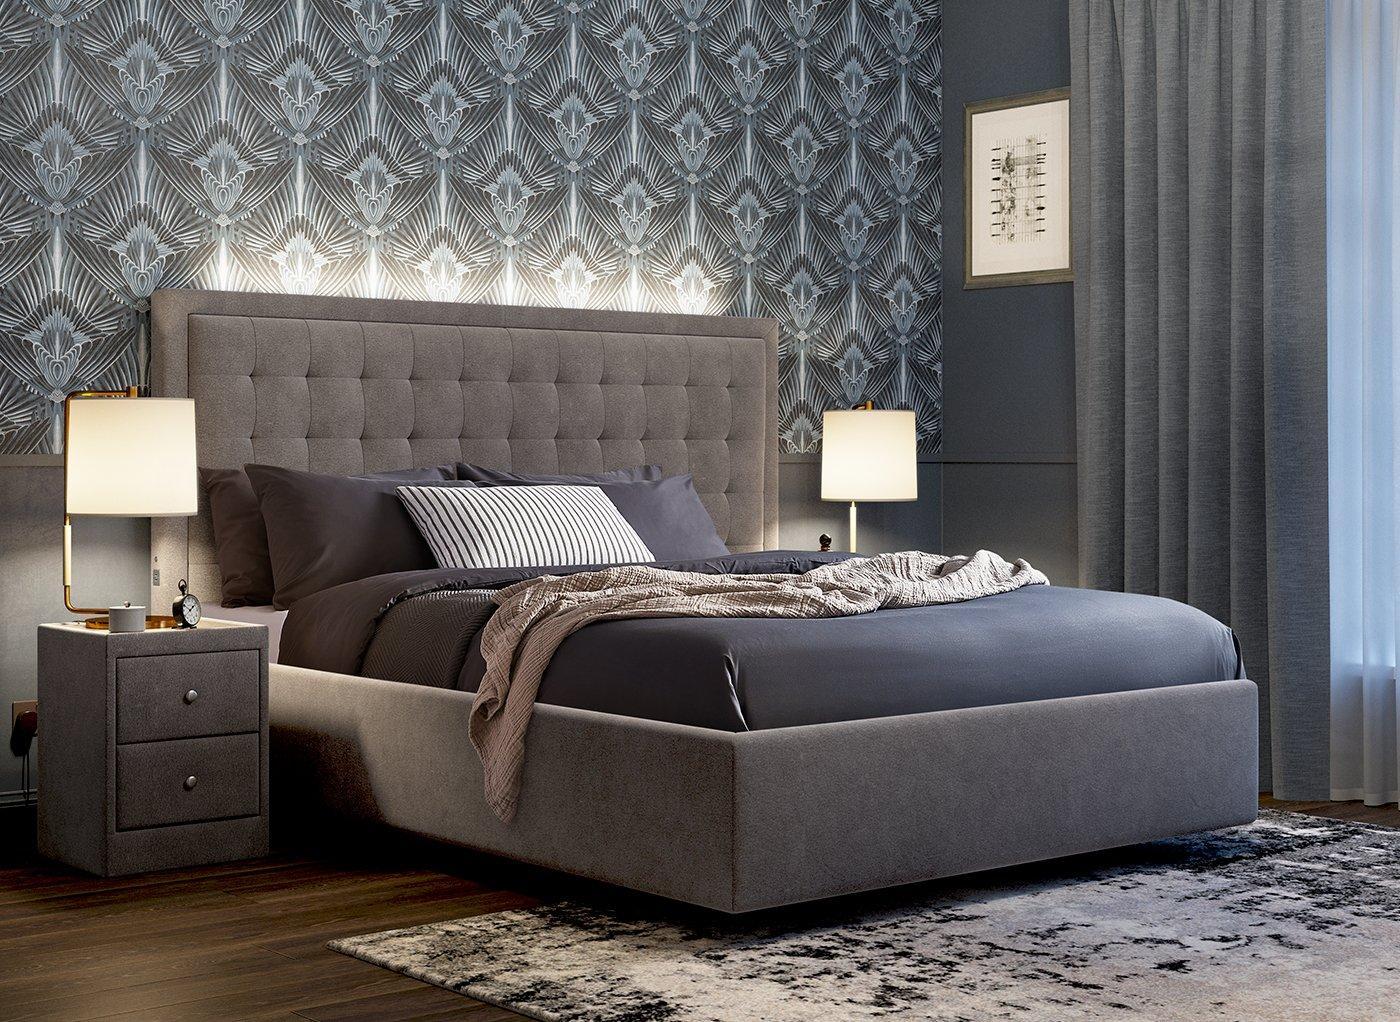 Hodgson Upholstered Bed Frame With Headboard LED Lights (£799)